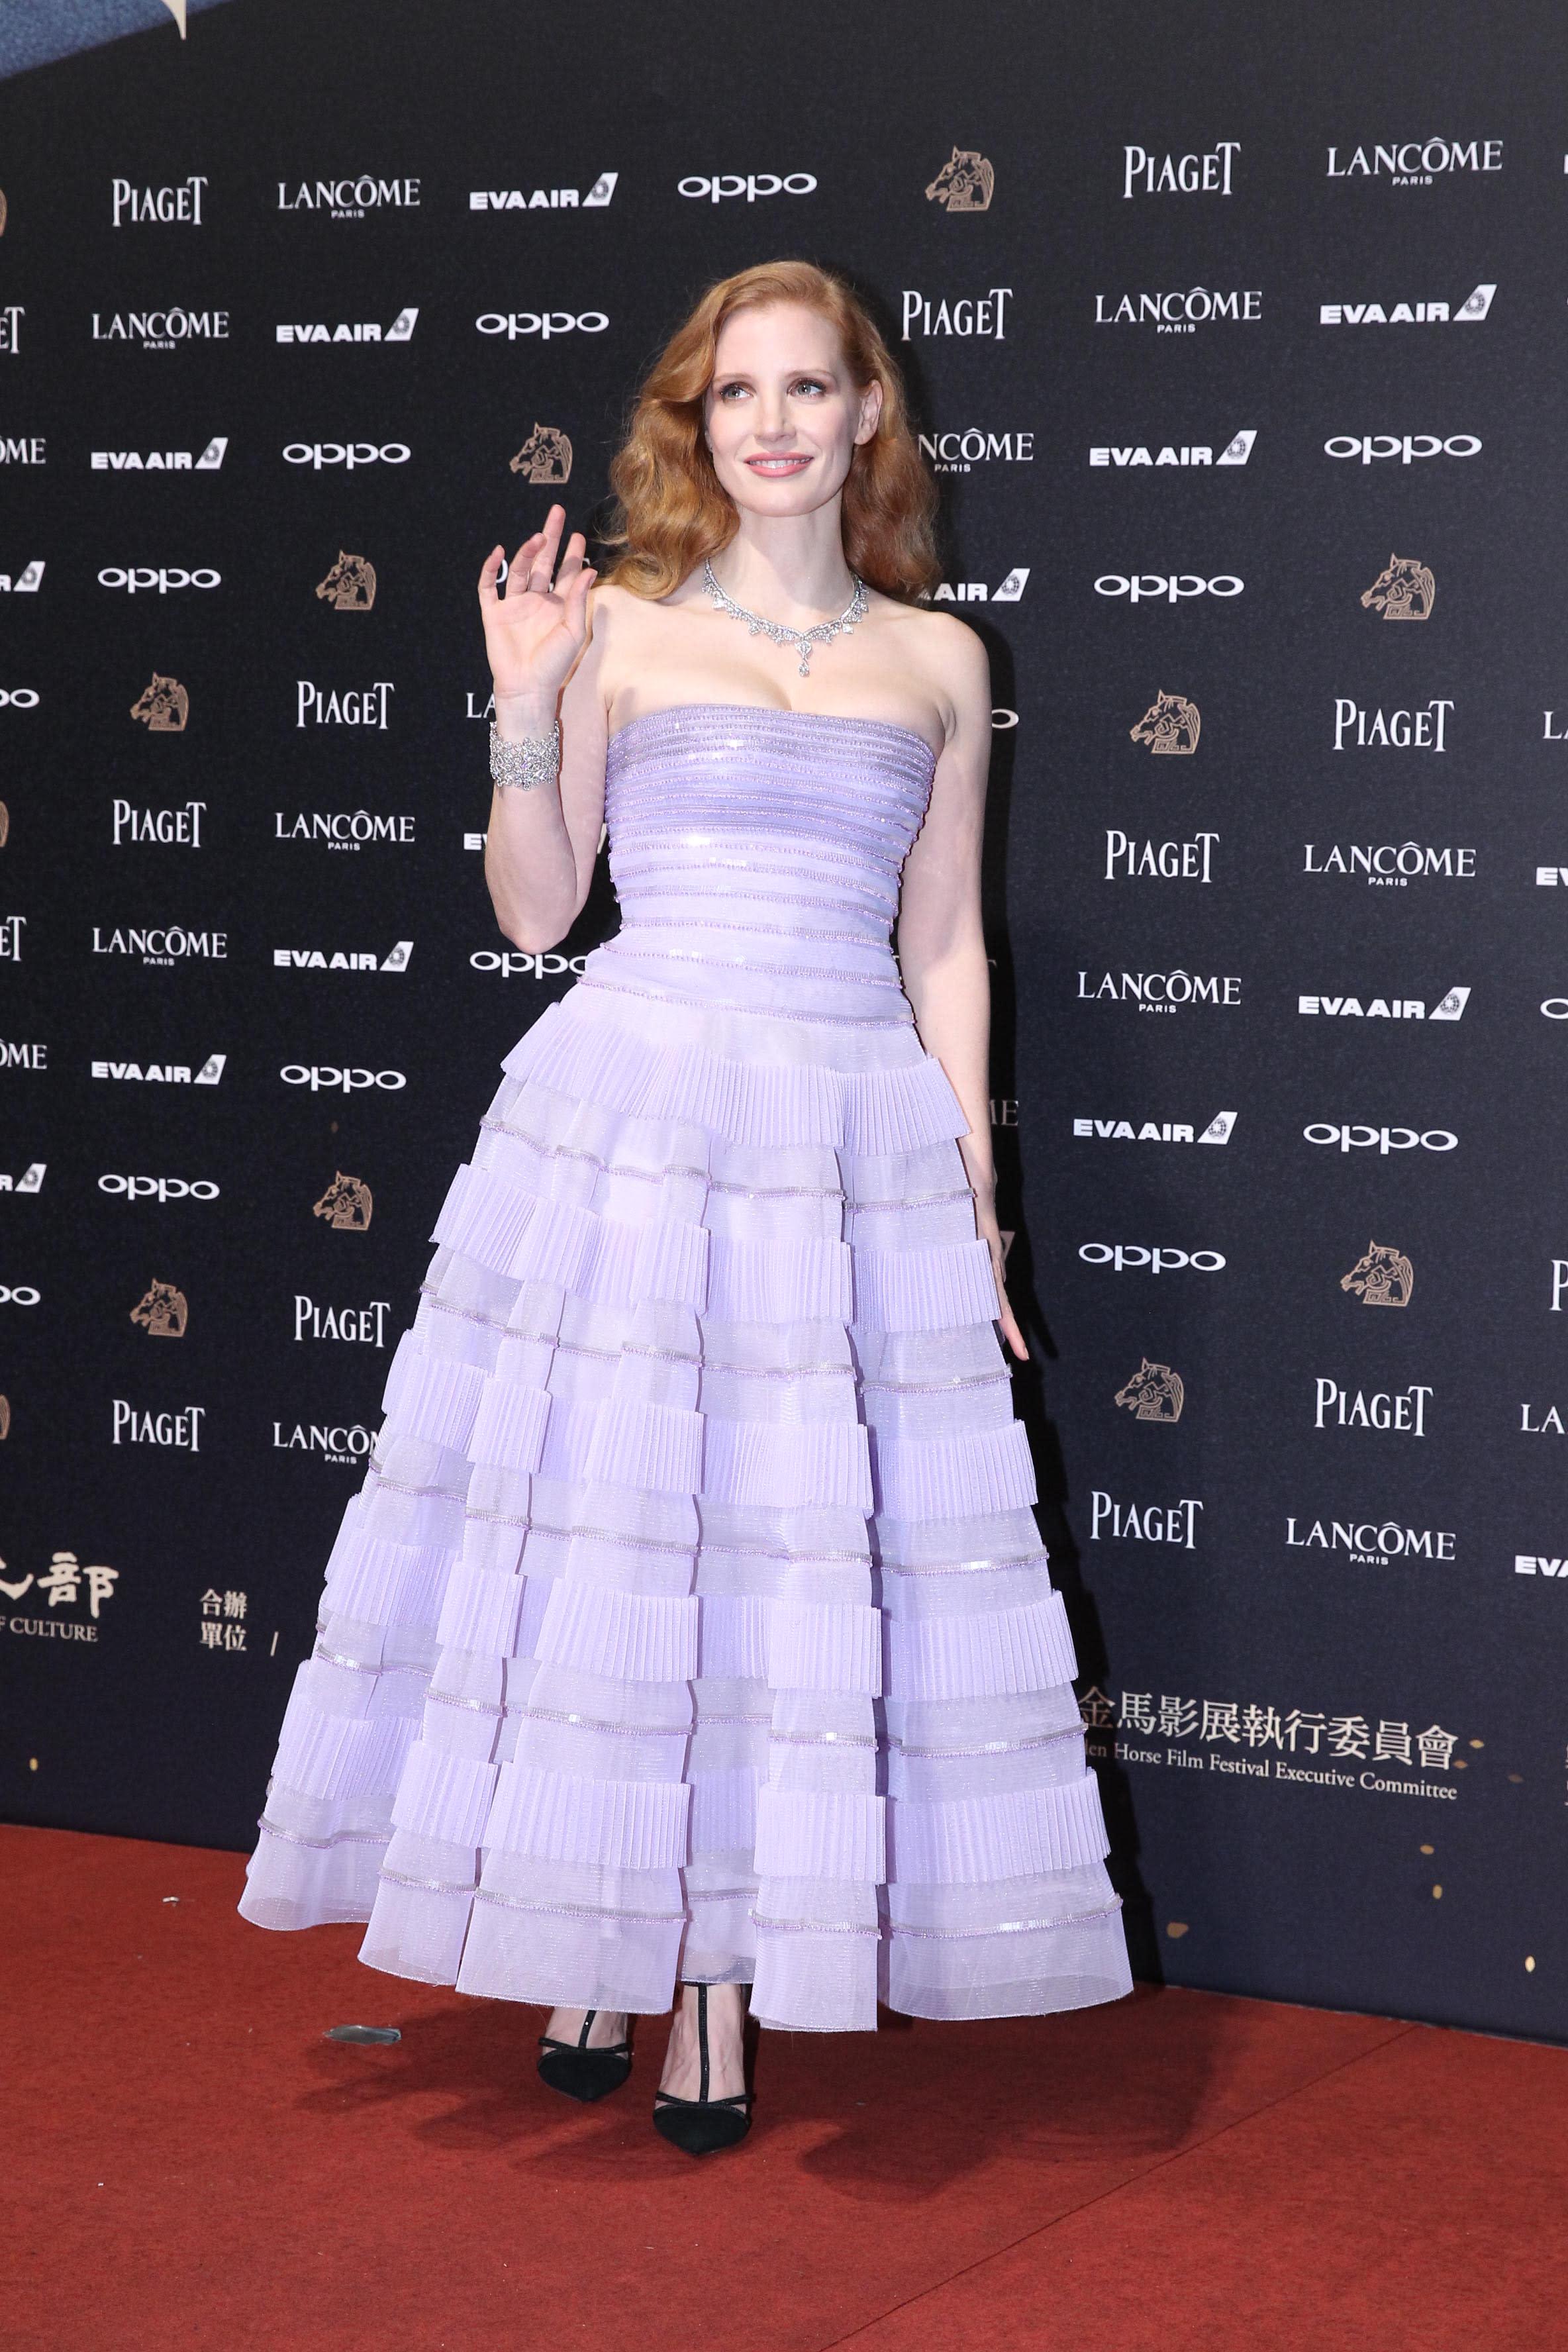 <p>紅毯壓軸女星是PIAGET大使,國際影后潔西卡崔絲坦(Jessica Chastain)這次來到台灣,一襲薰衣草紫平口洋裝現身金馬紅毯,並頒獎最佳女主角獎項。(達志影像) </p>